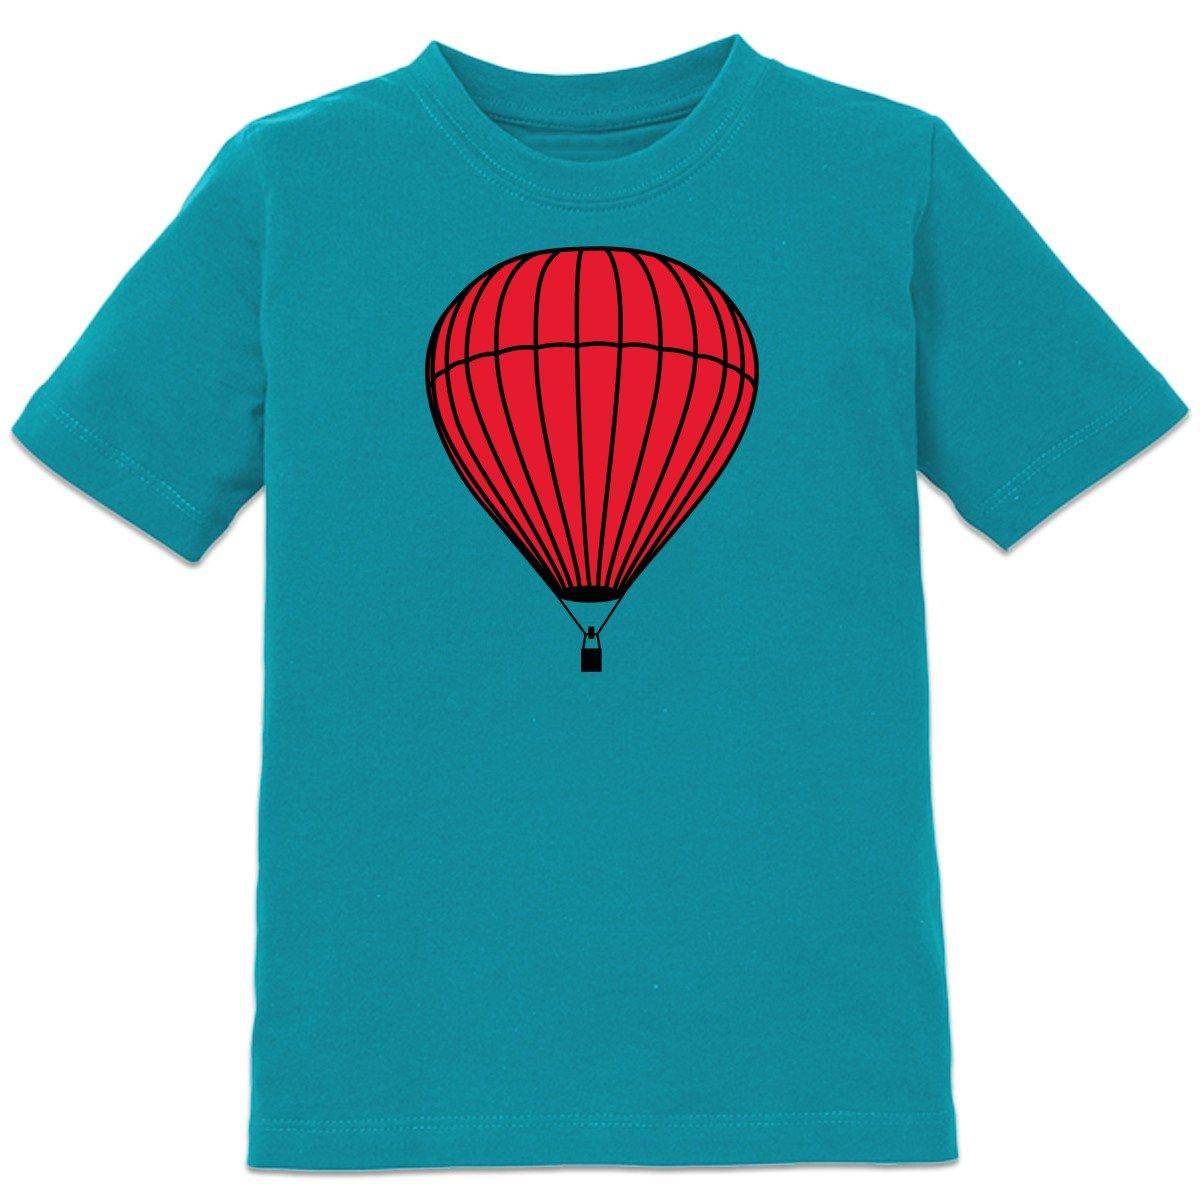 Shirtcity Hor Air Balloon Kinder T Shirt By Amazonde Bekleidung